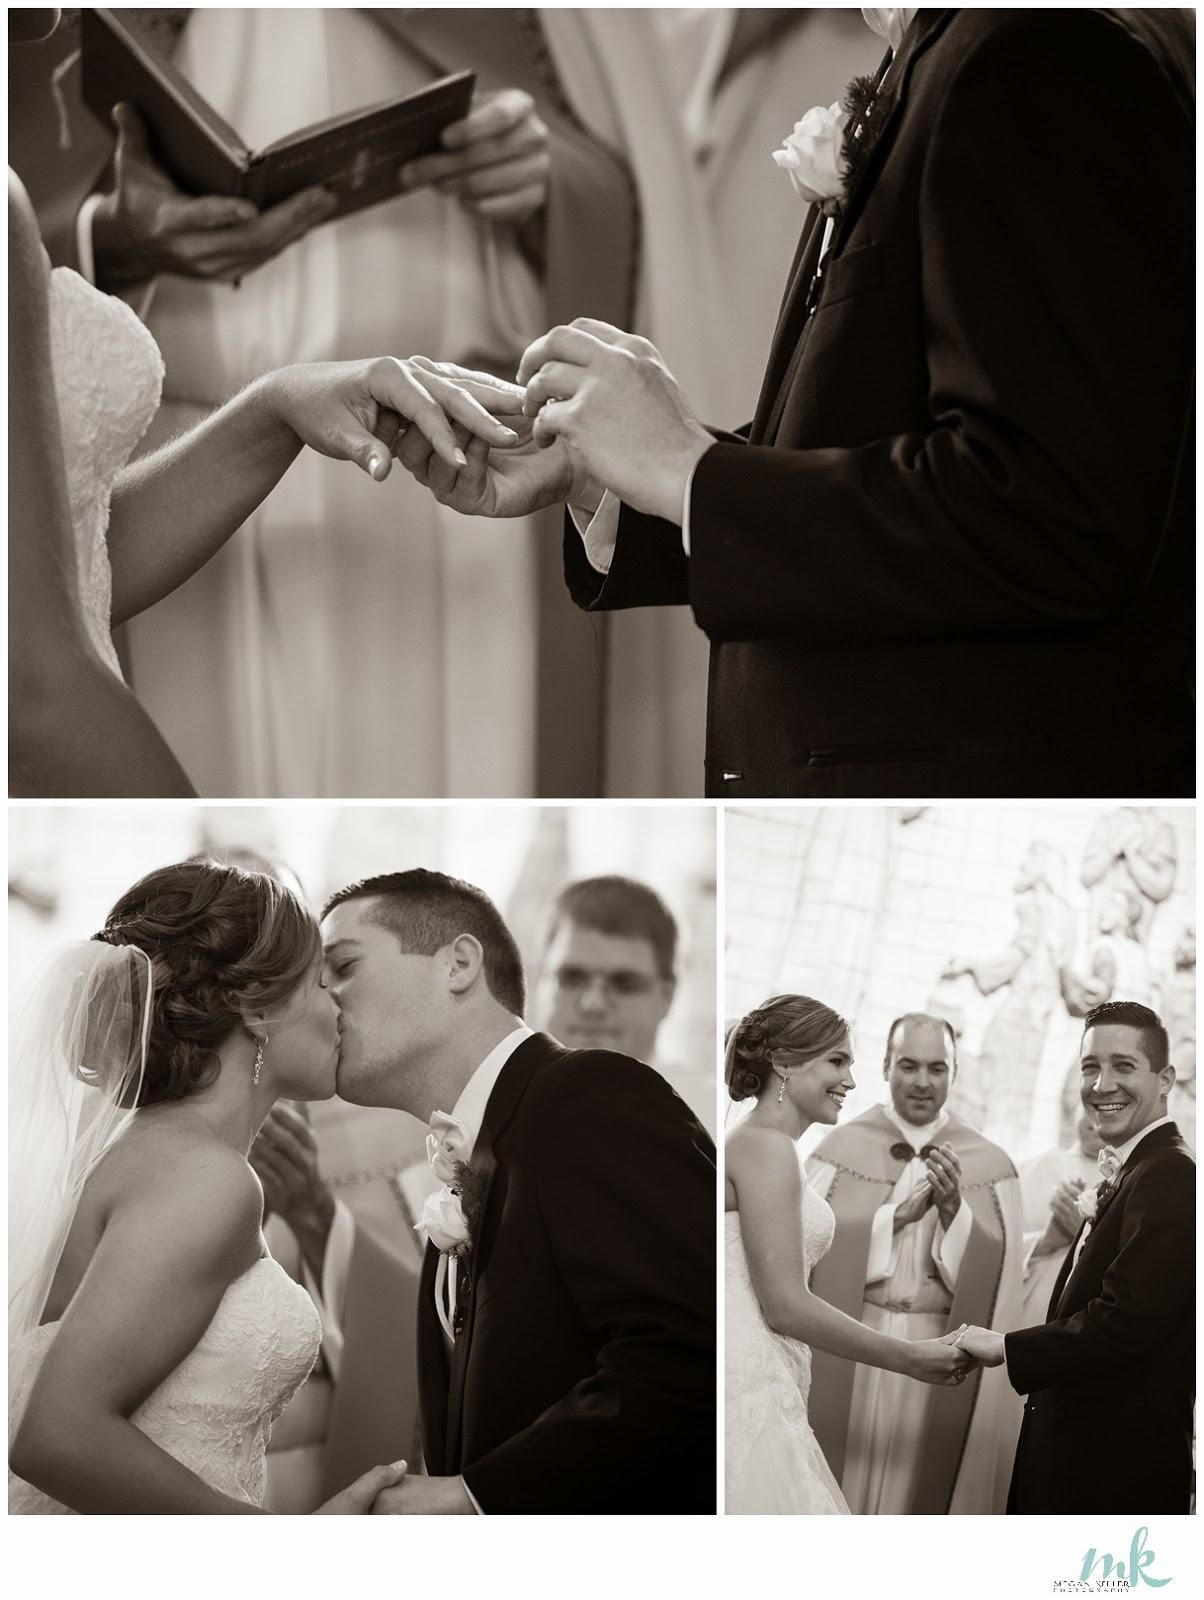 Danielle and Dan's wedding Danielle and Dan's wedding 2014 07 16 0005